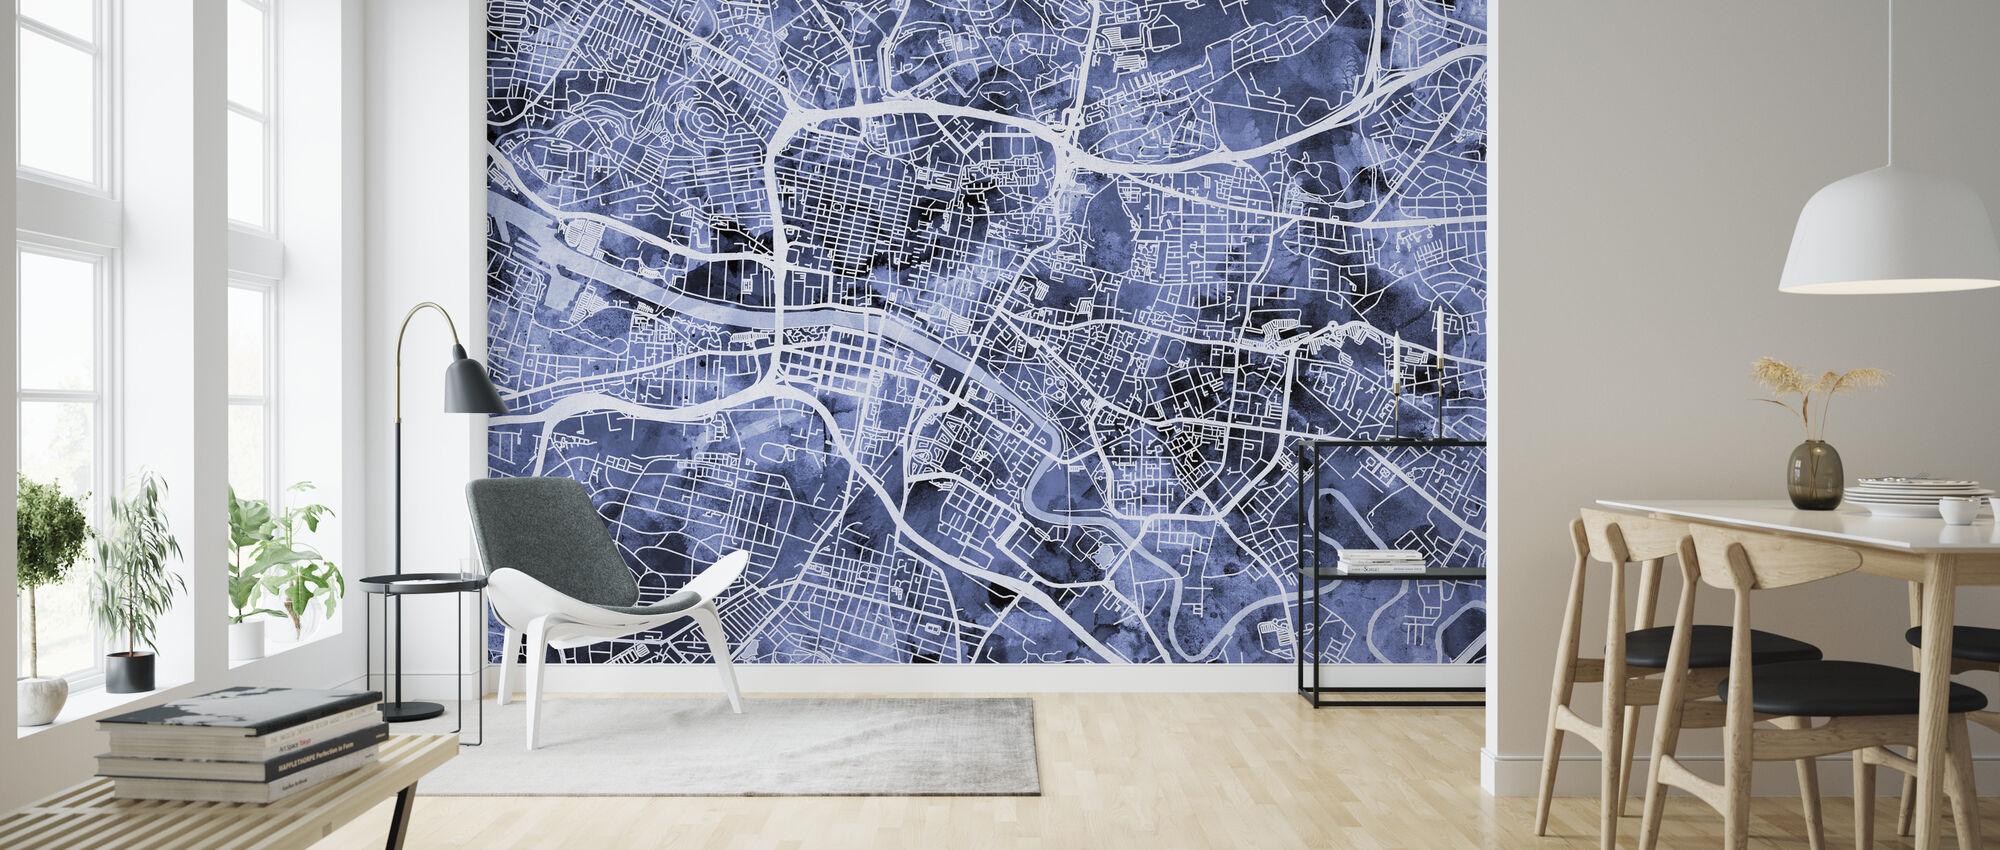 Glasgow Street Map - Wallpaper - Living Room